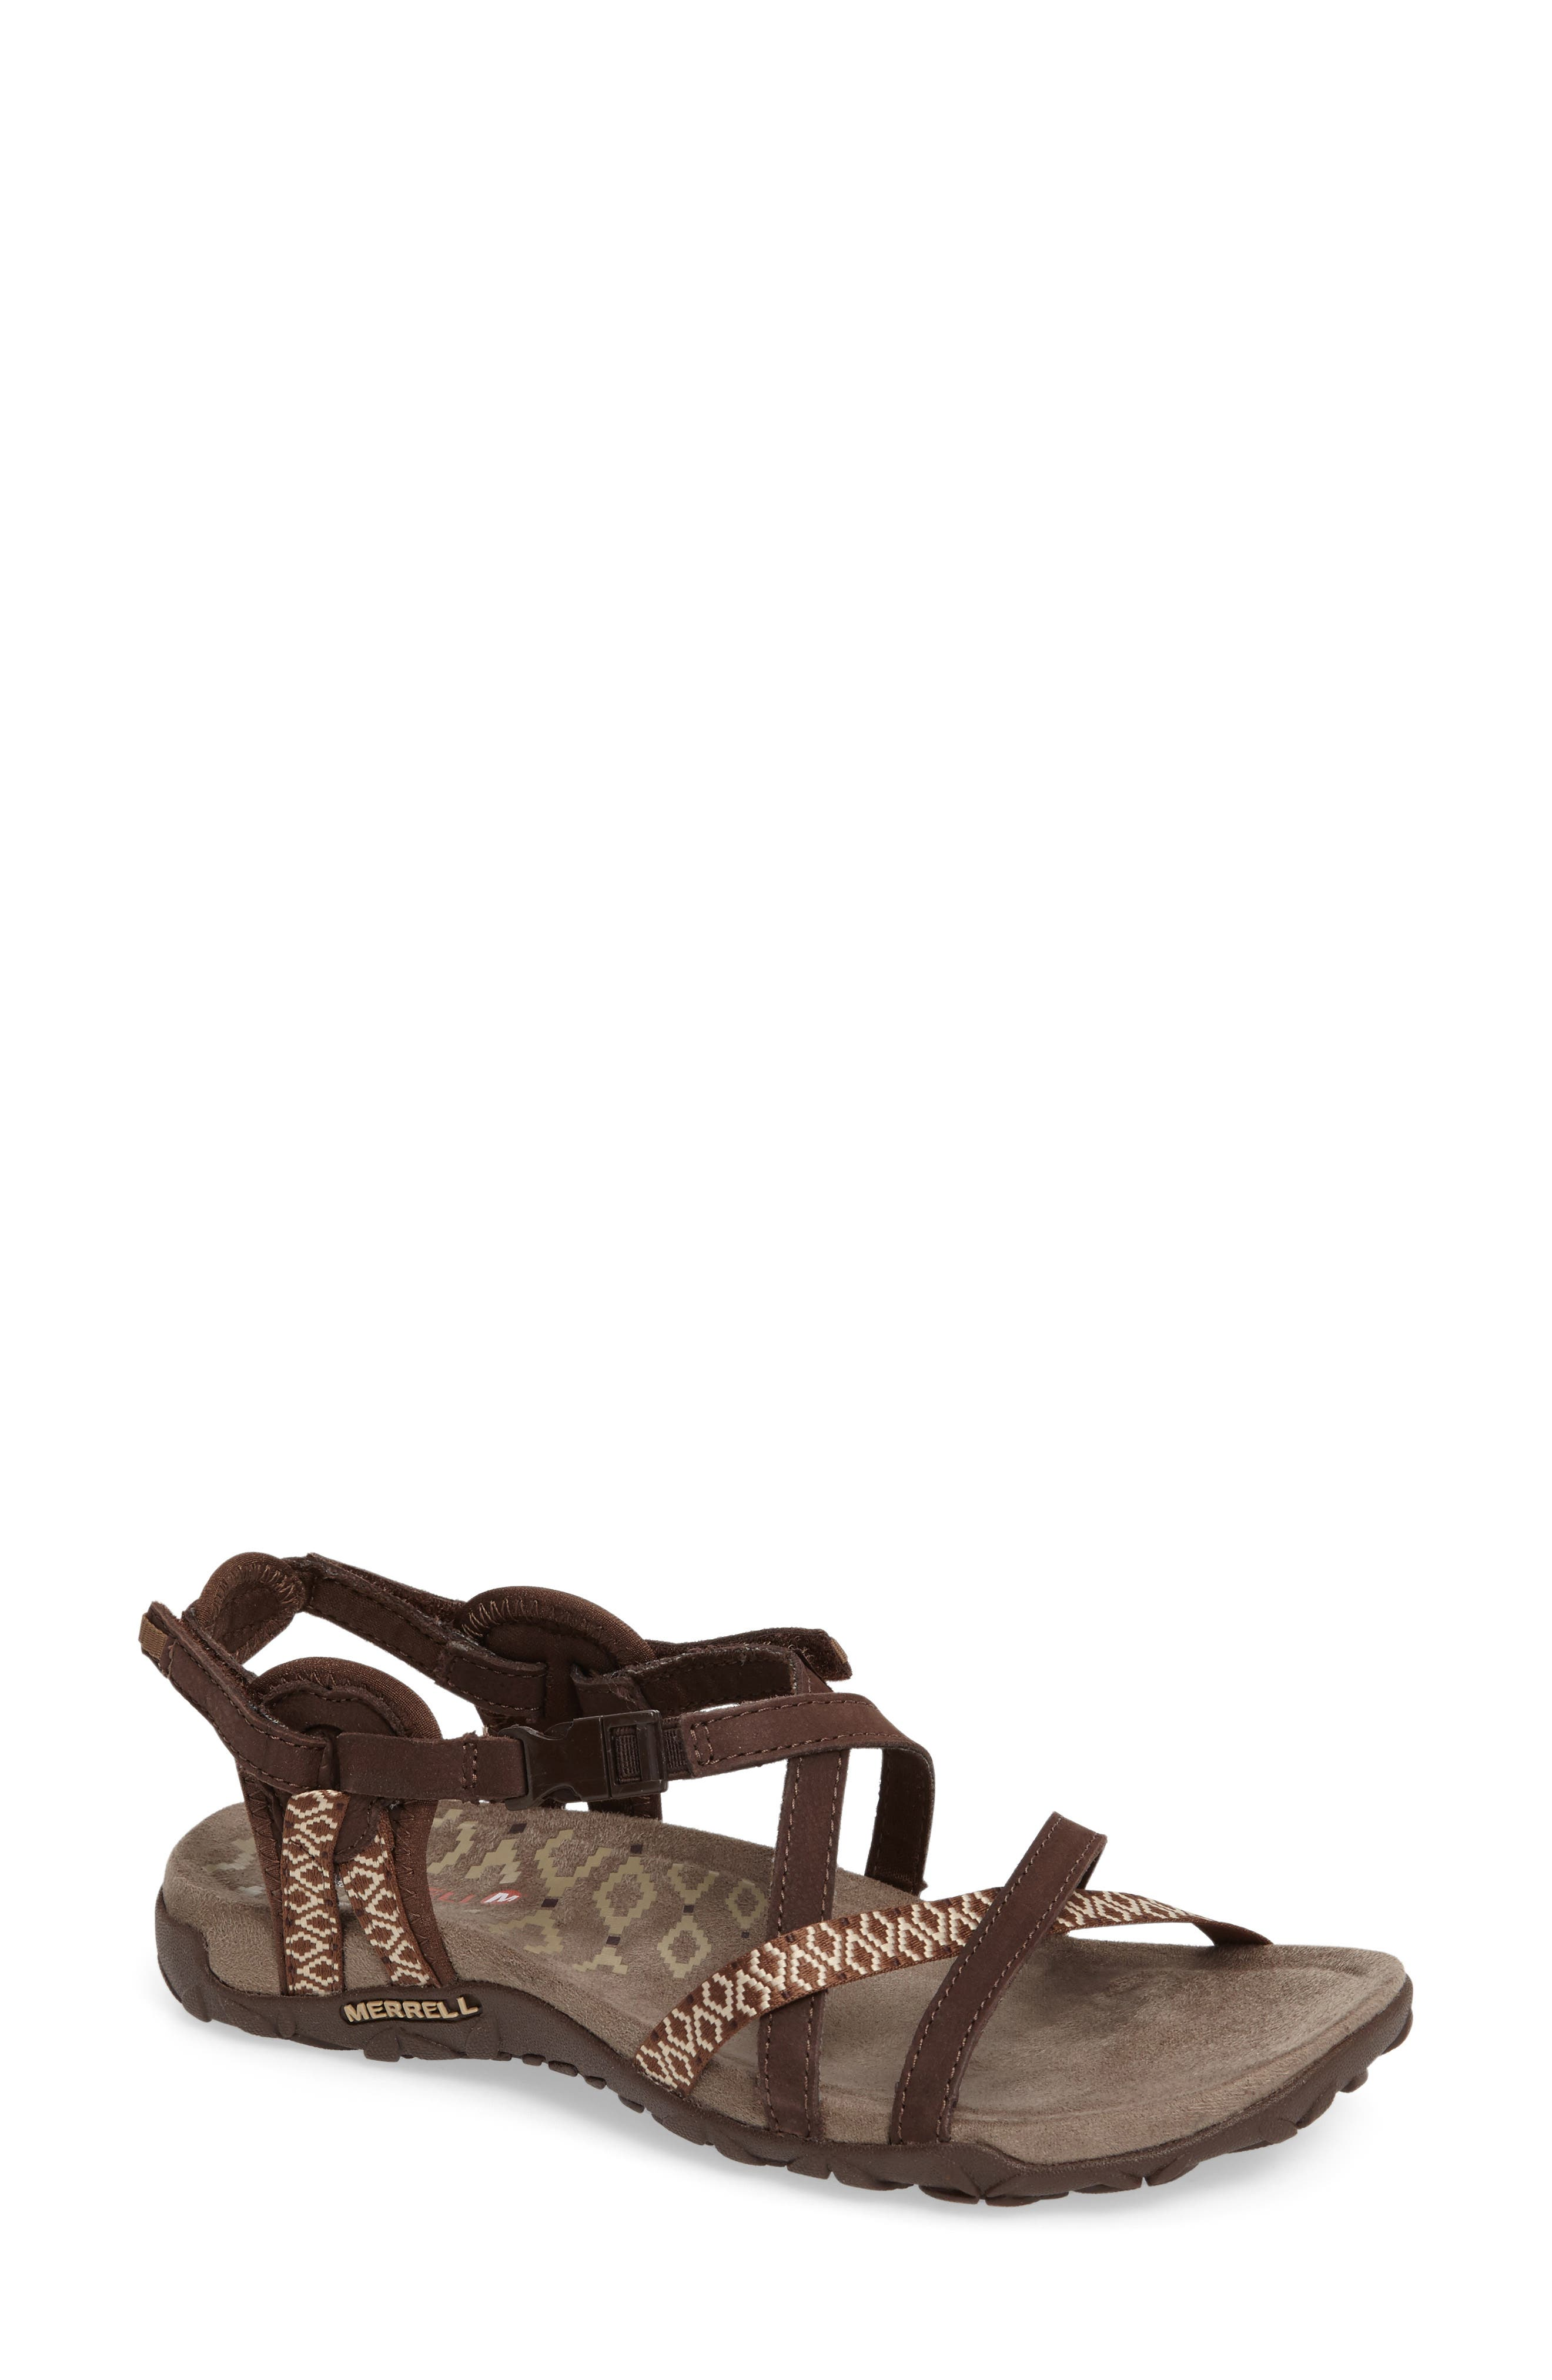 'Terran Lattice II' Sandal,                         Main,                         color, Dark Earth Leather